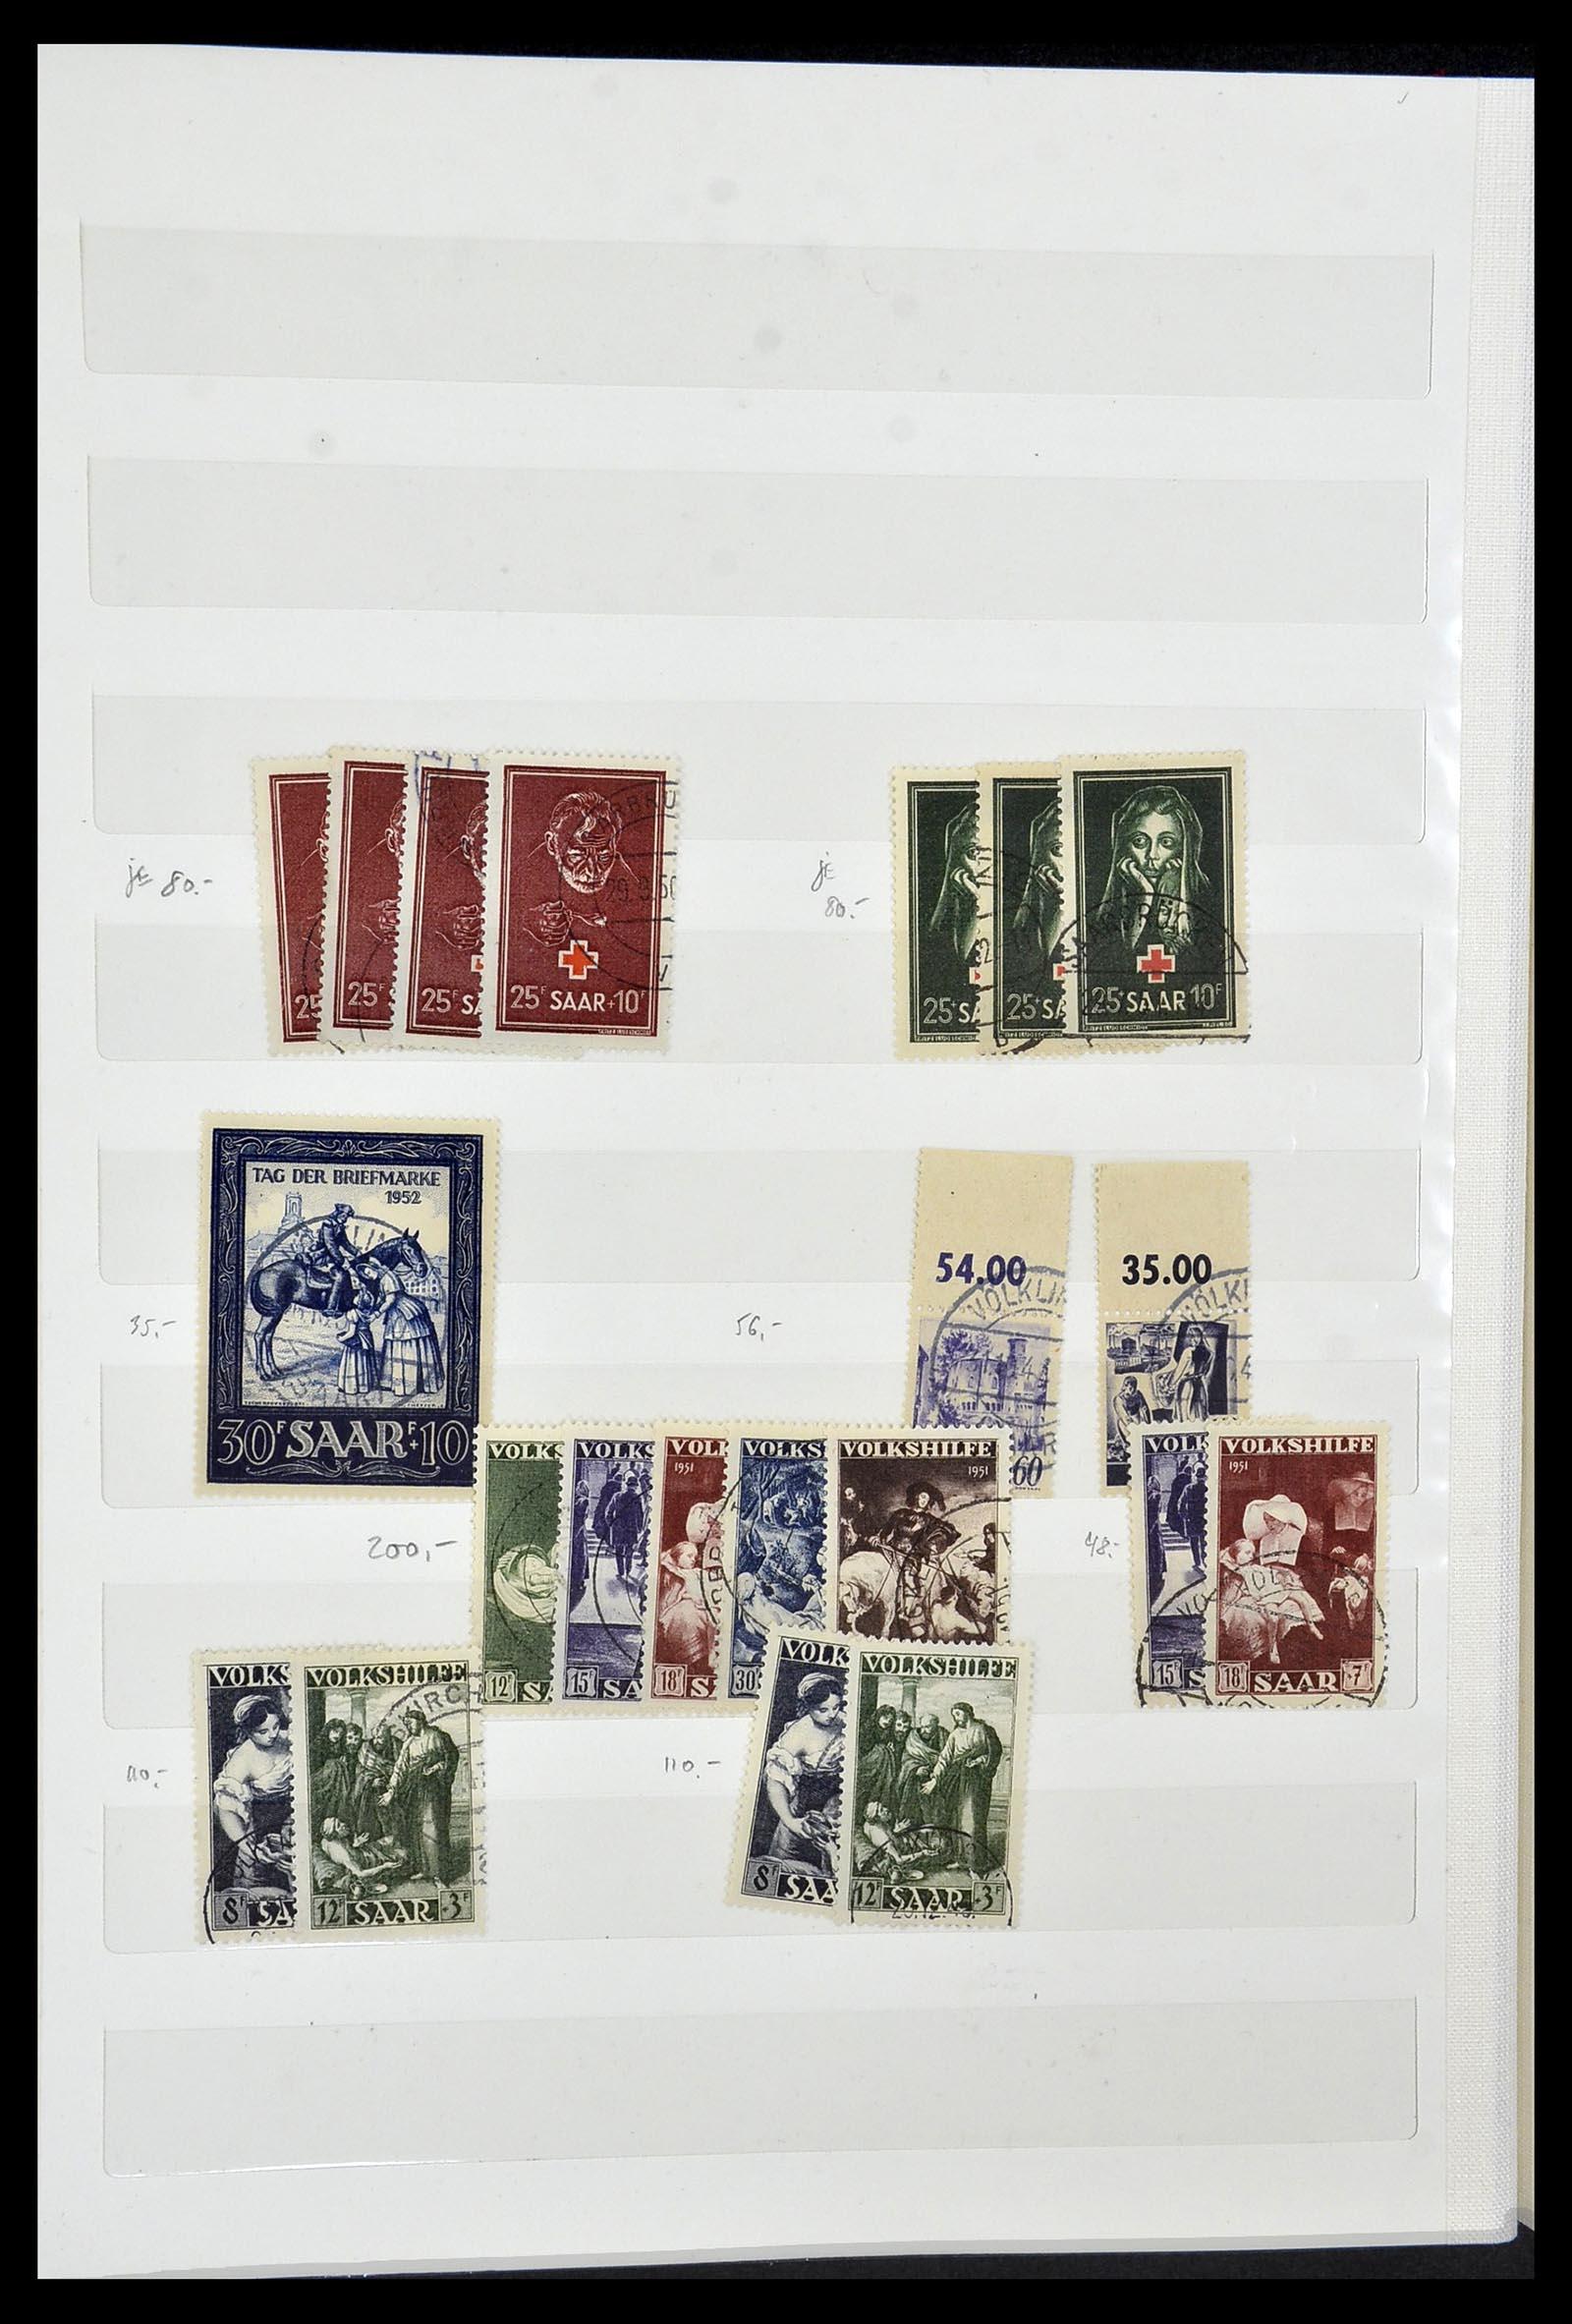 34069 006 - Postzegelverzameling 34069 Duitsland 1855-1952.